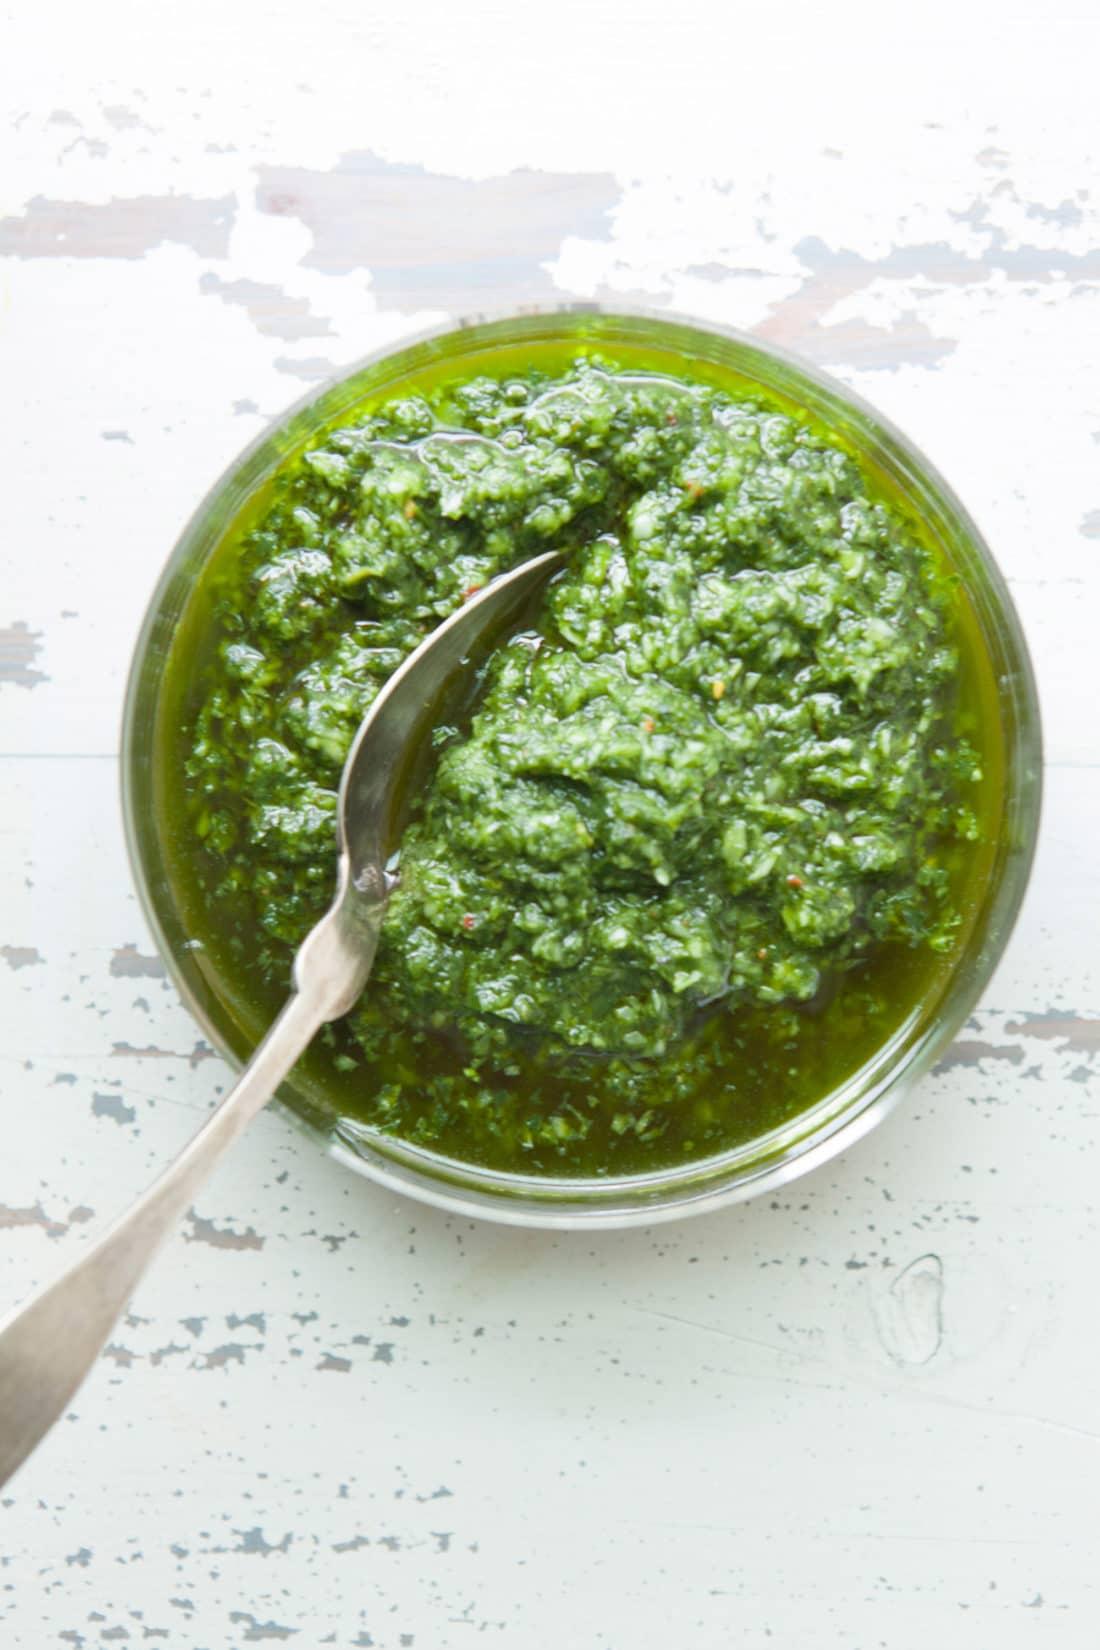 Ramp Chimichurri Sauce / Photo by Kerri Brewer / Katie Workman / themom100.com